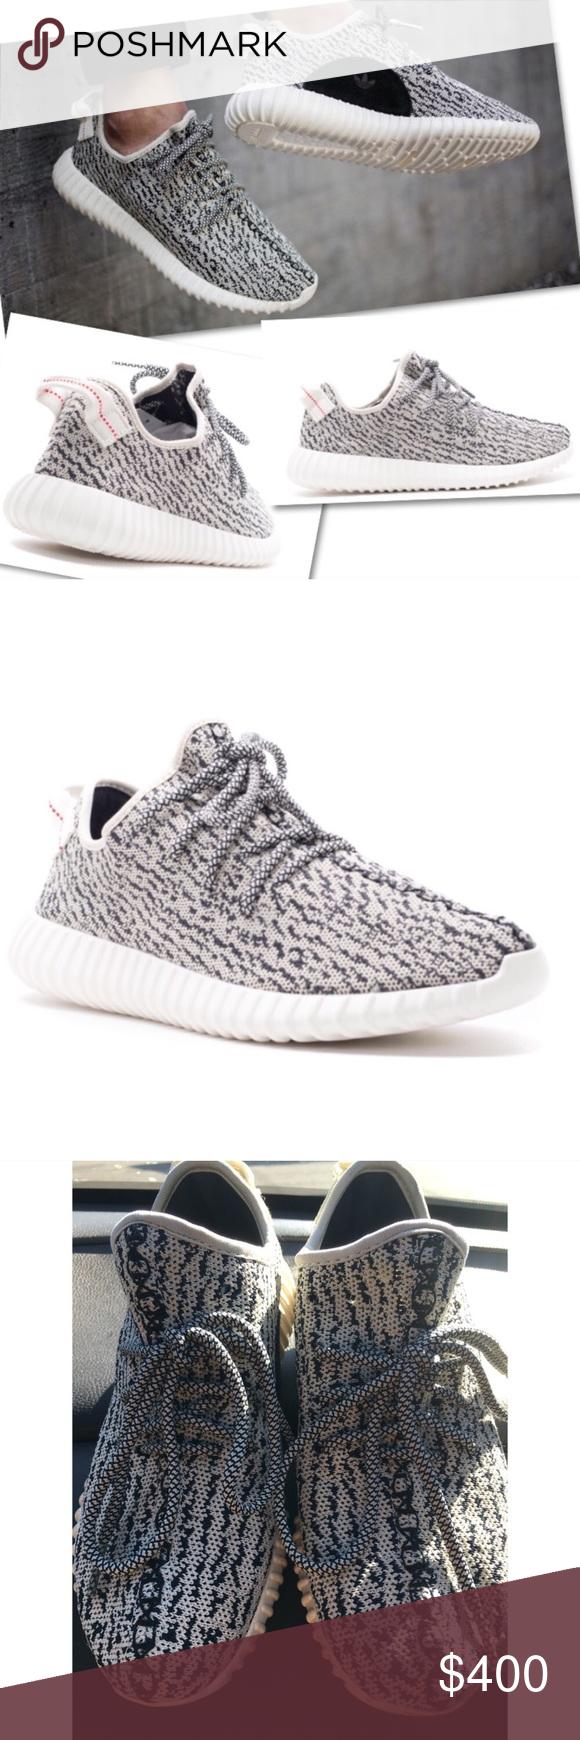 Auth Adidas Yeezy Boost 350 tórtola zapatillas Authentic adidas